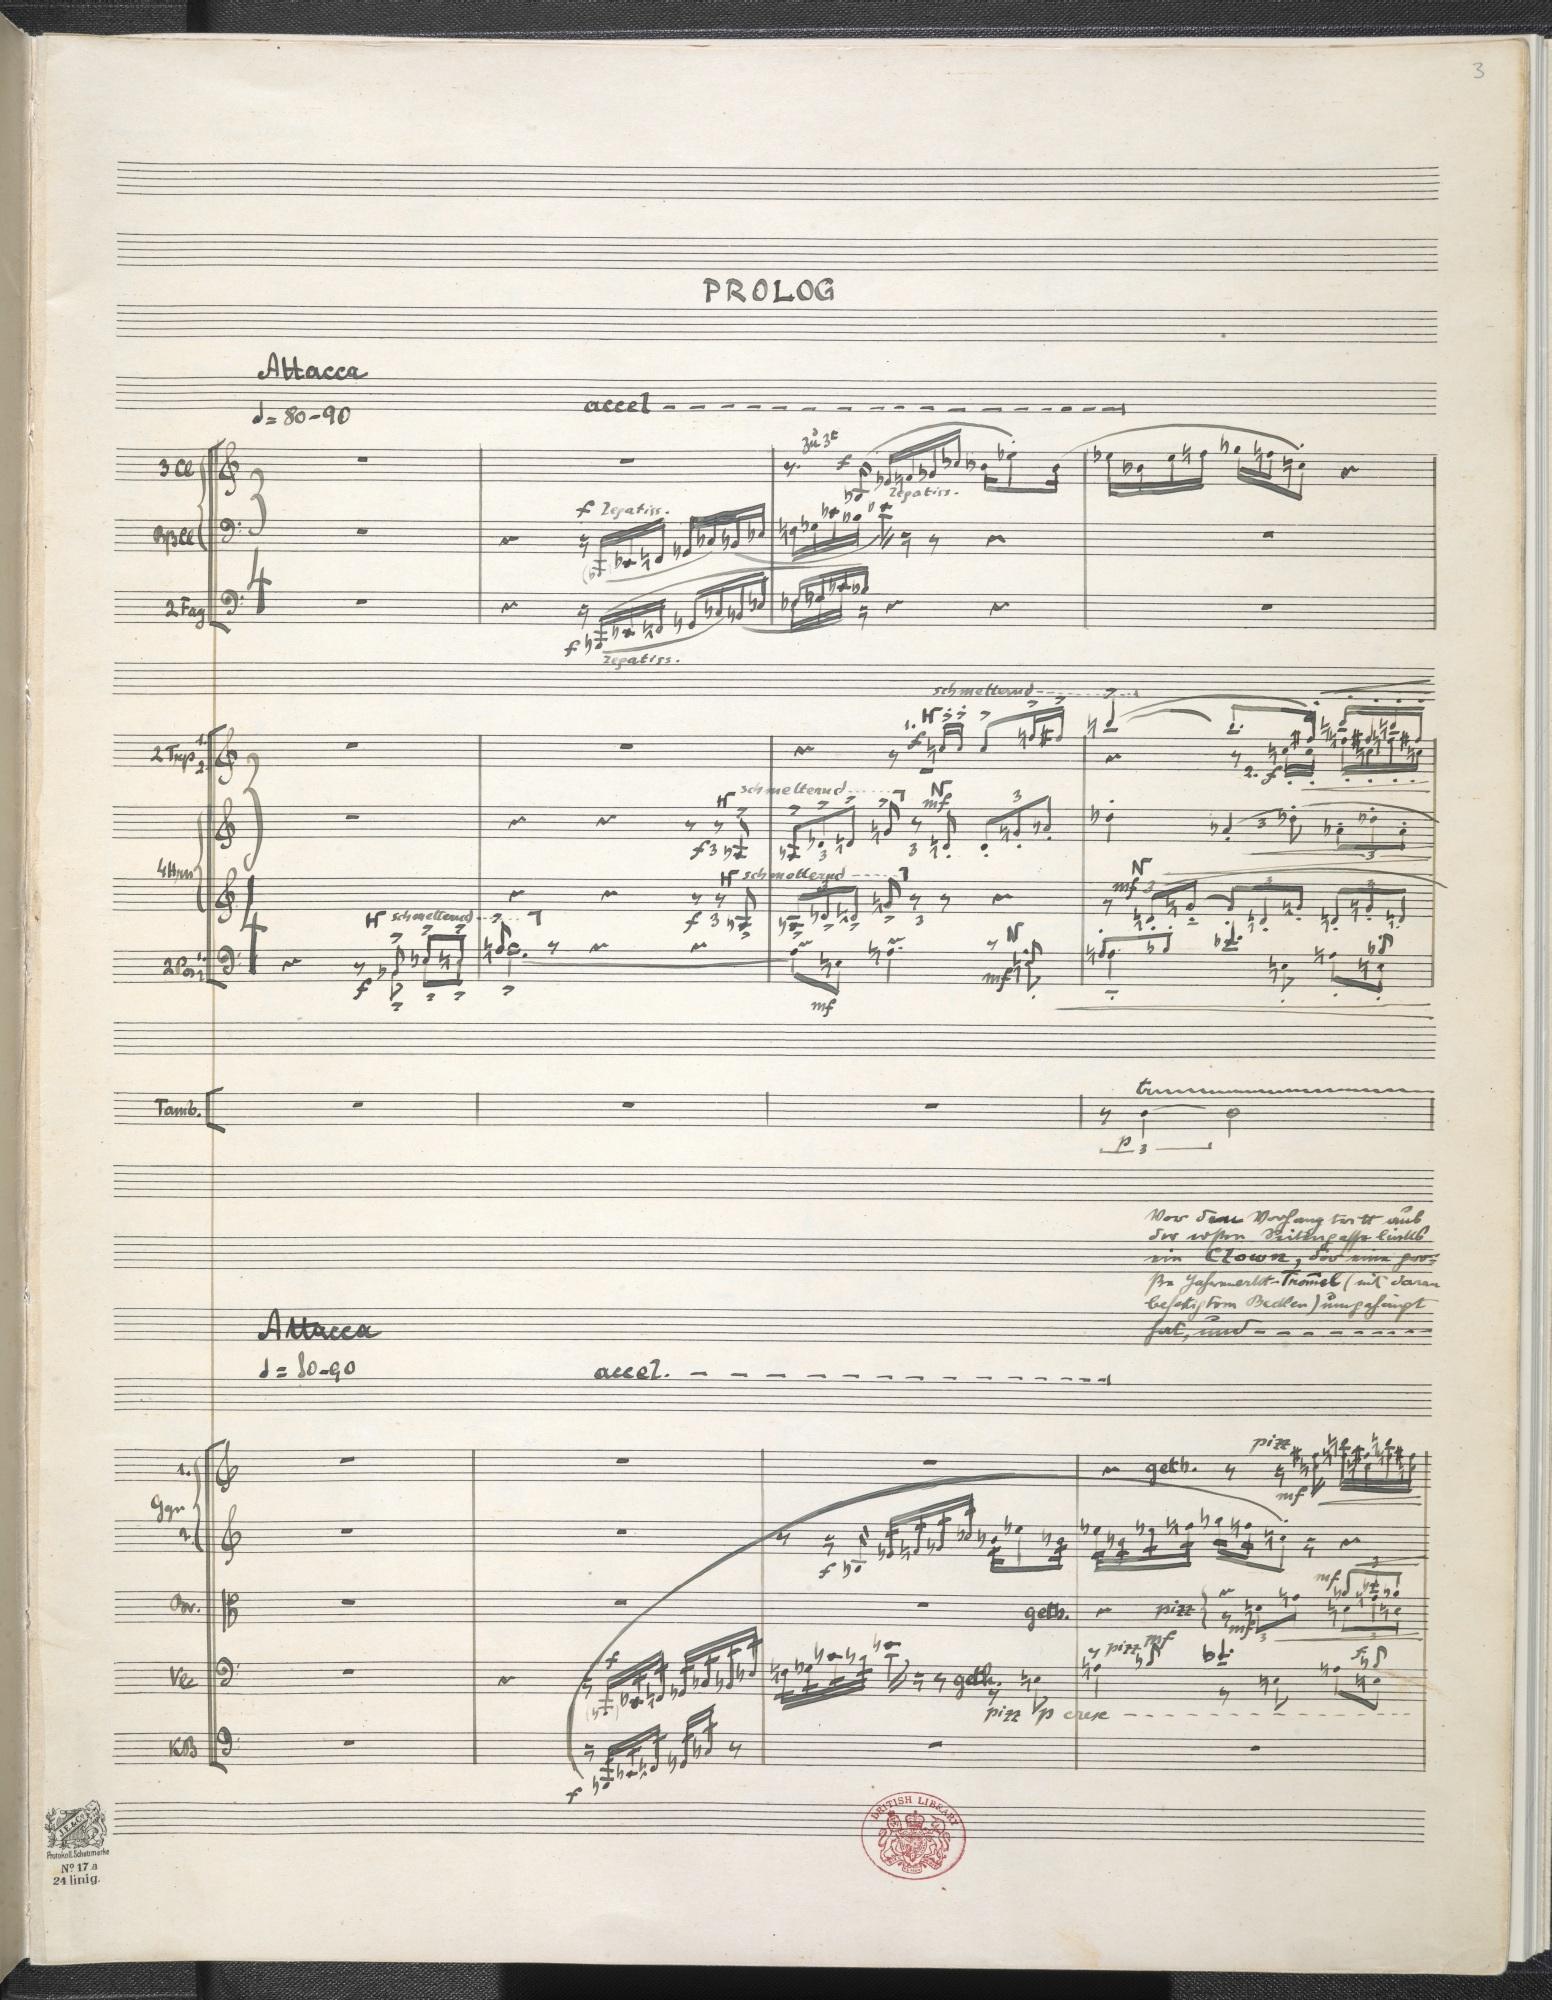 The Second Viennese School: Alban Berg, Arnold Schoenberg